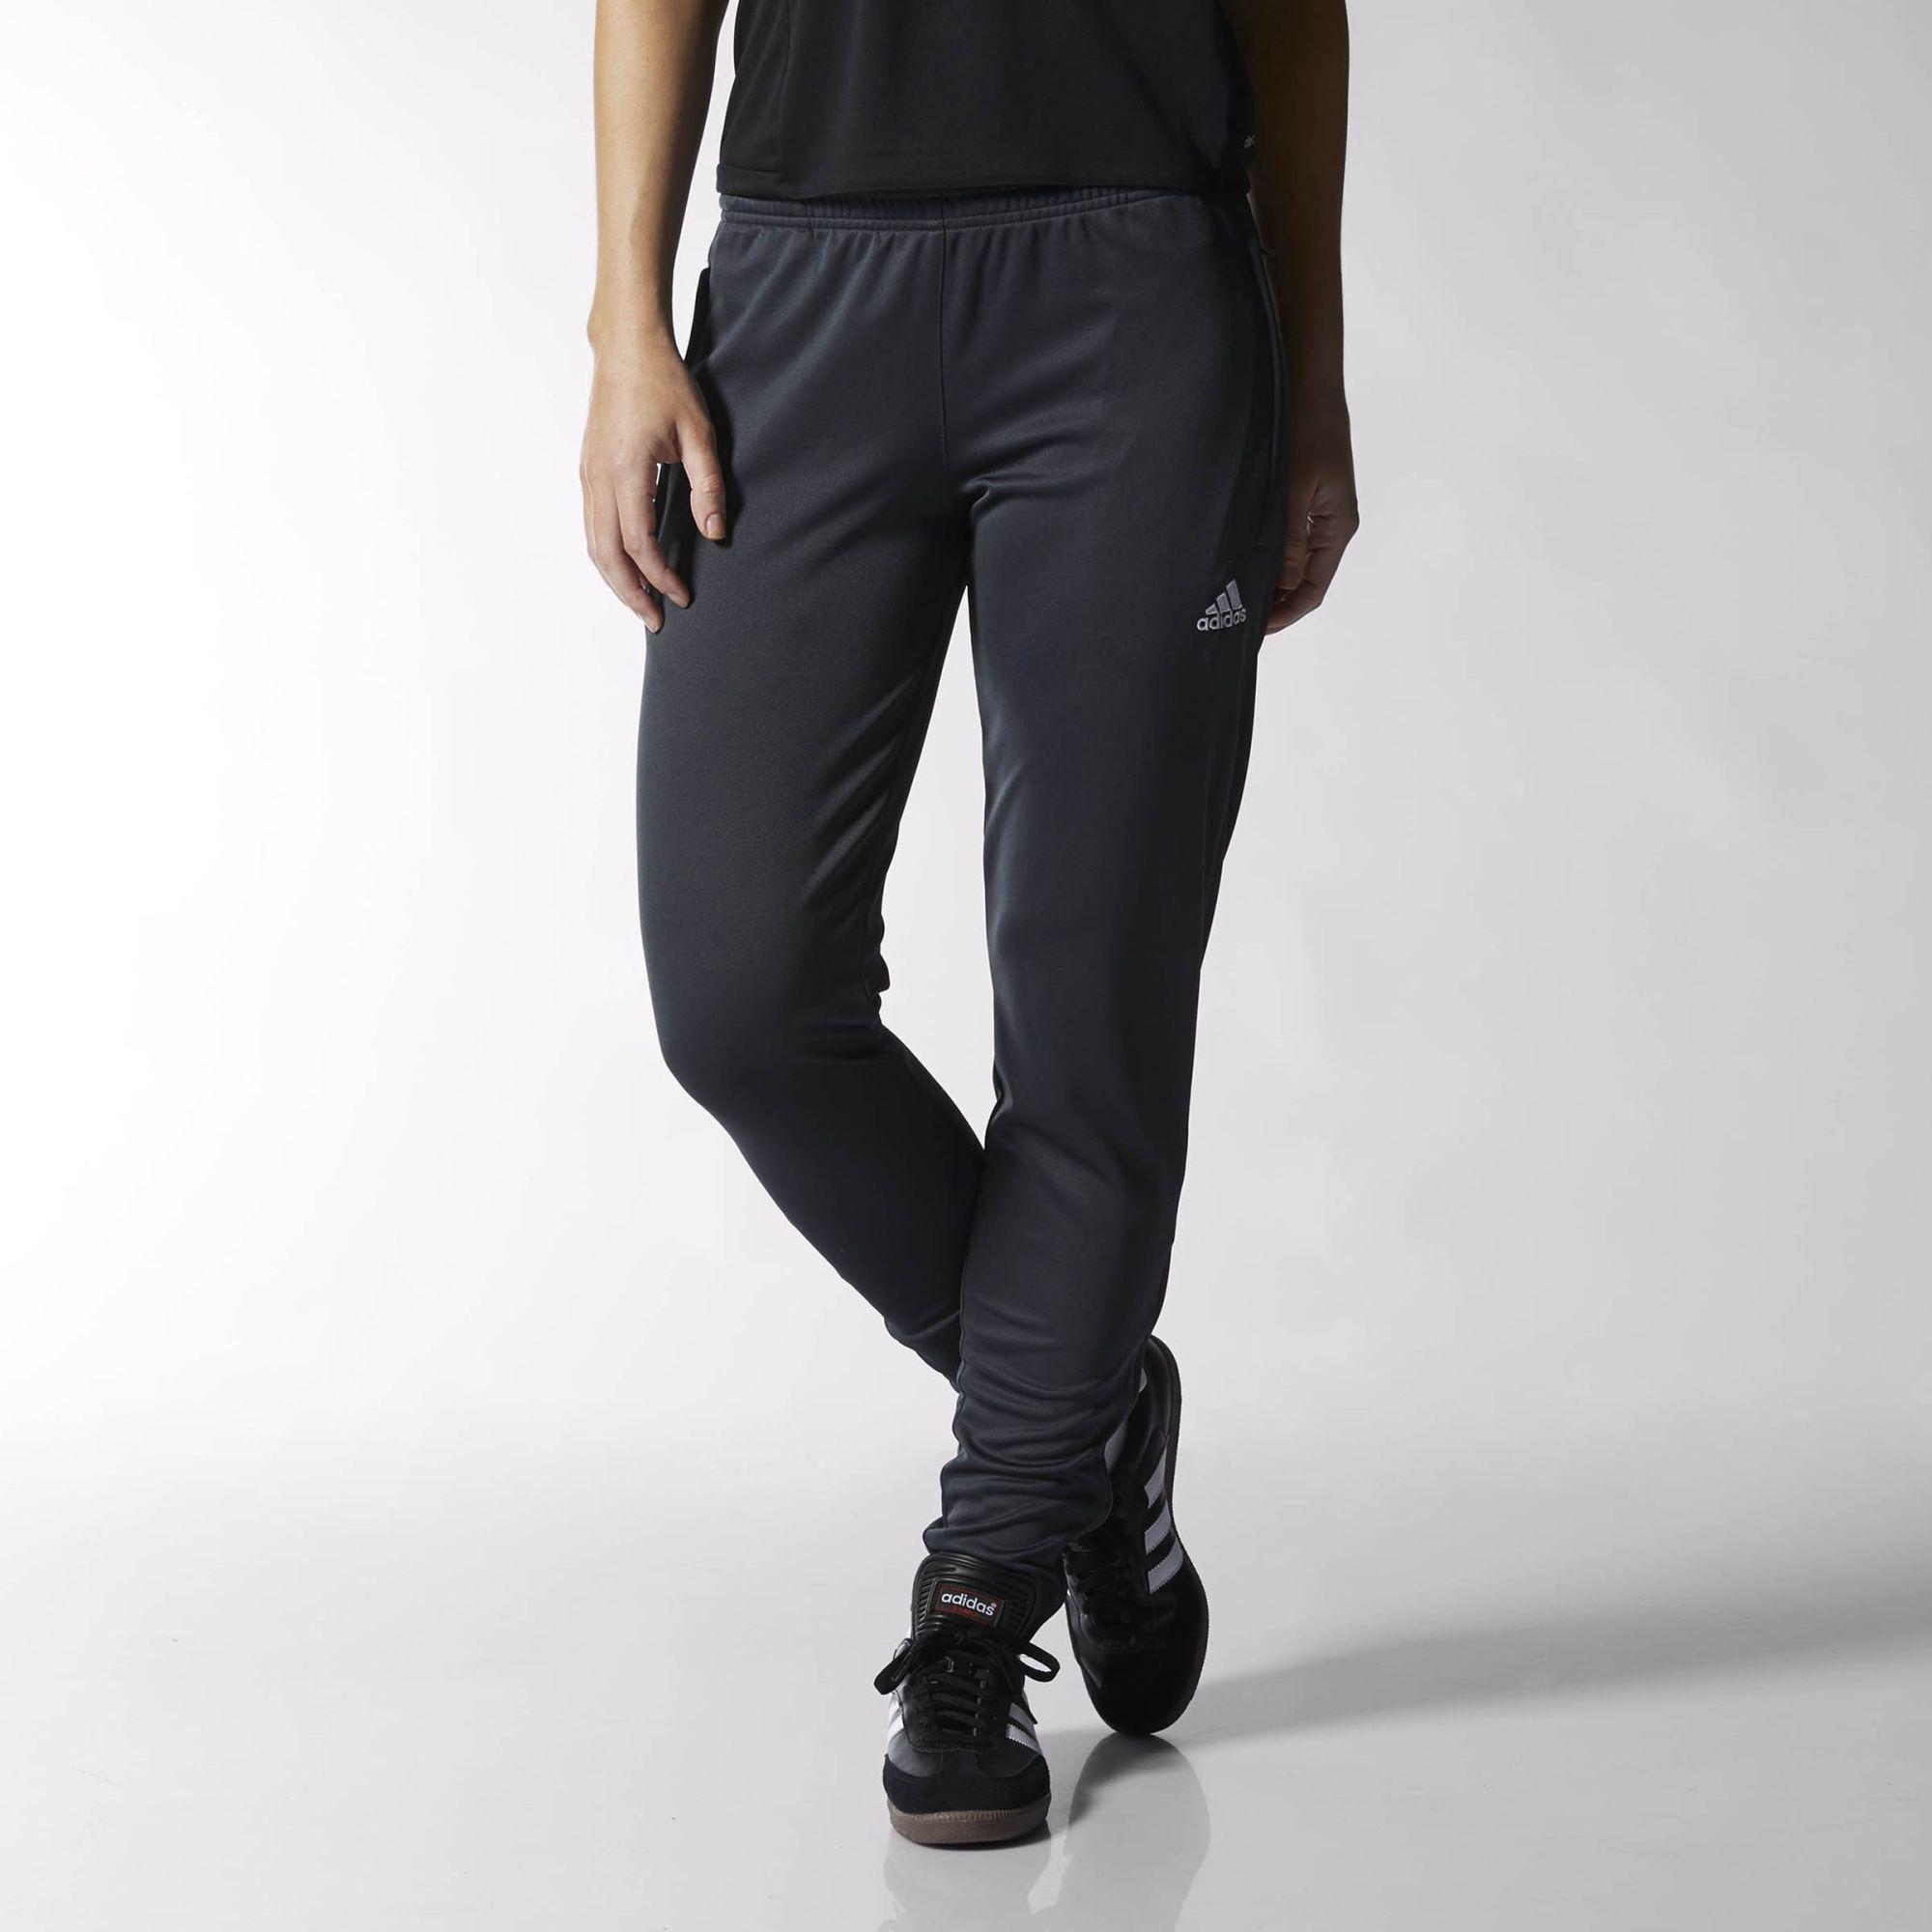 adidas core 15 training jersey